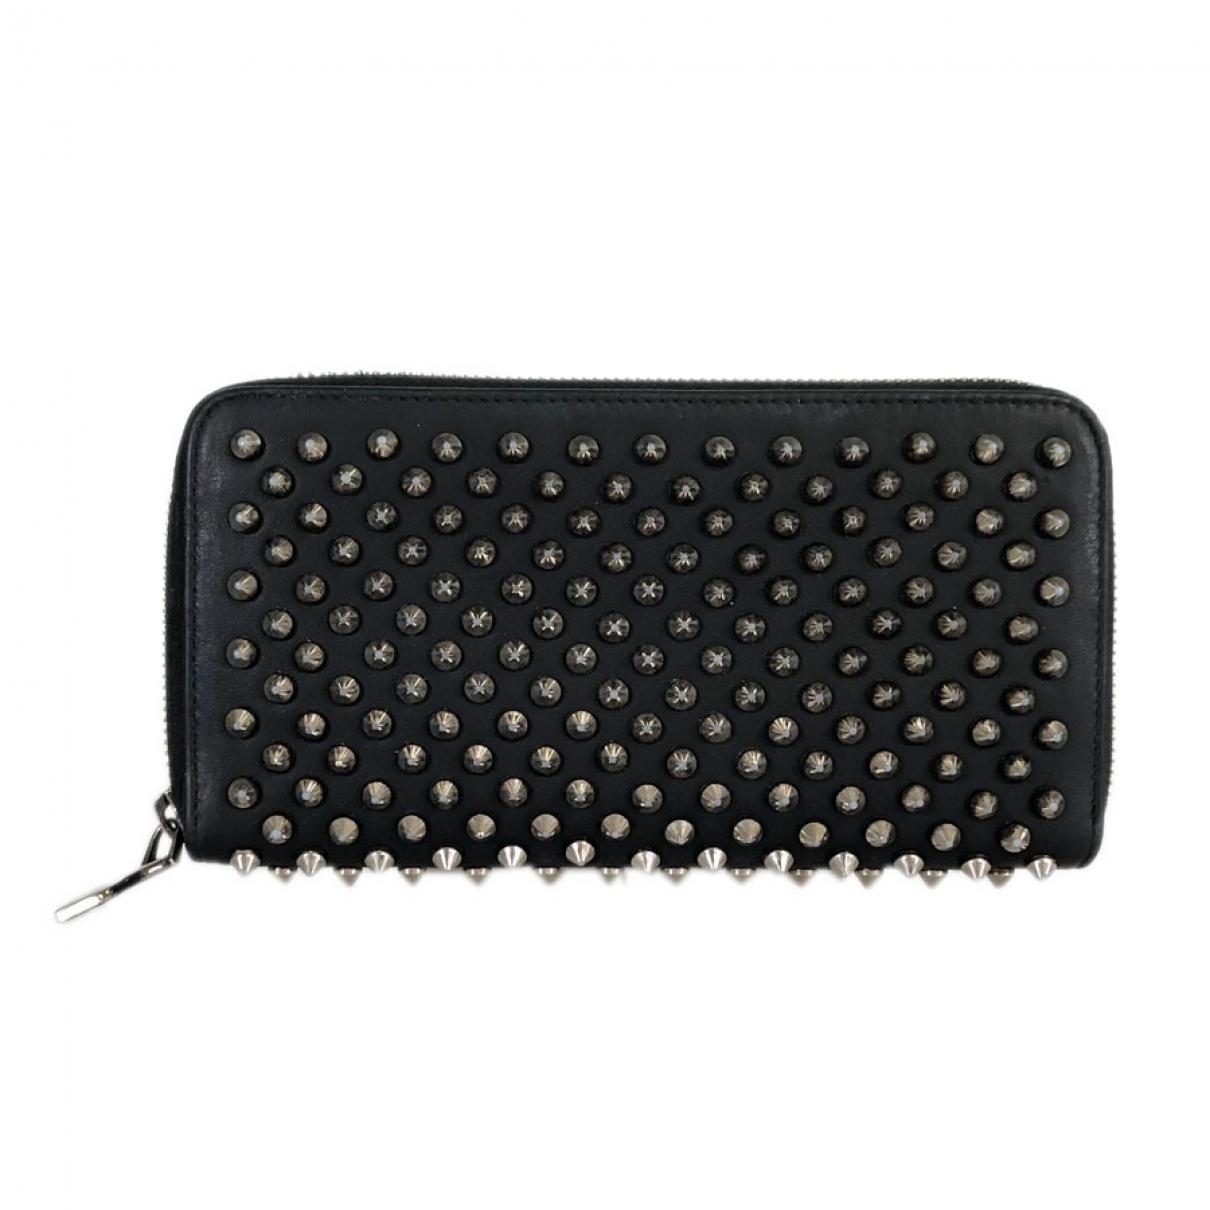 Christian Louboutin Panettone Black Leather wallet for Women \N